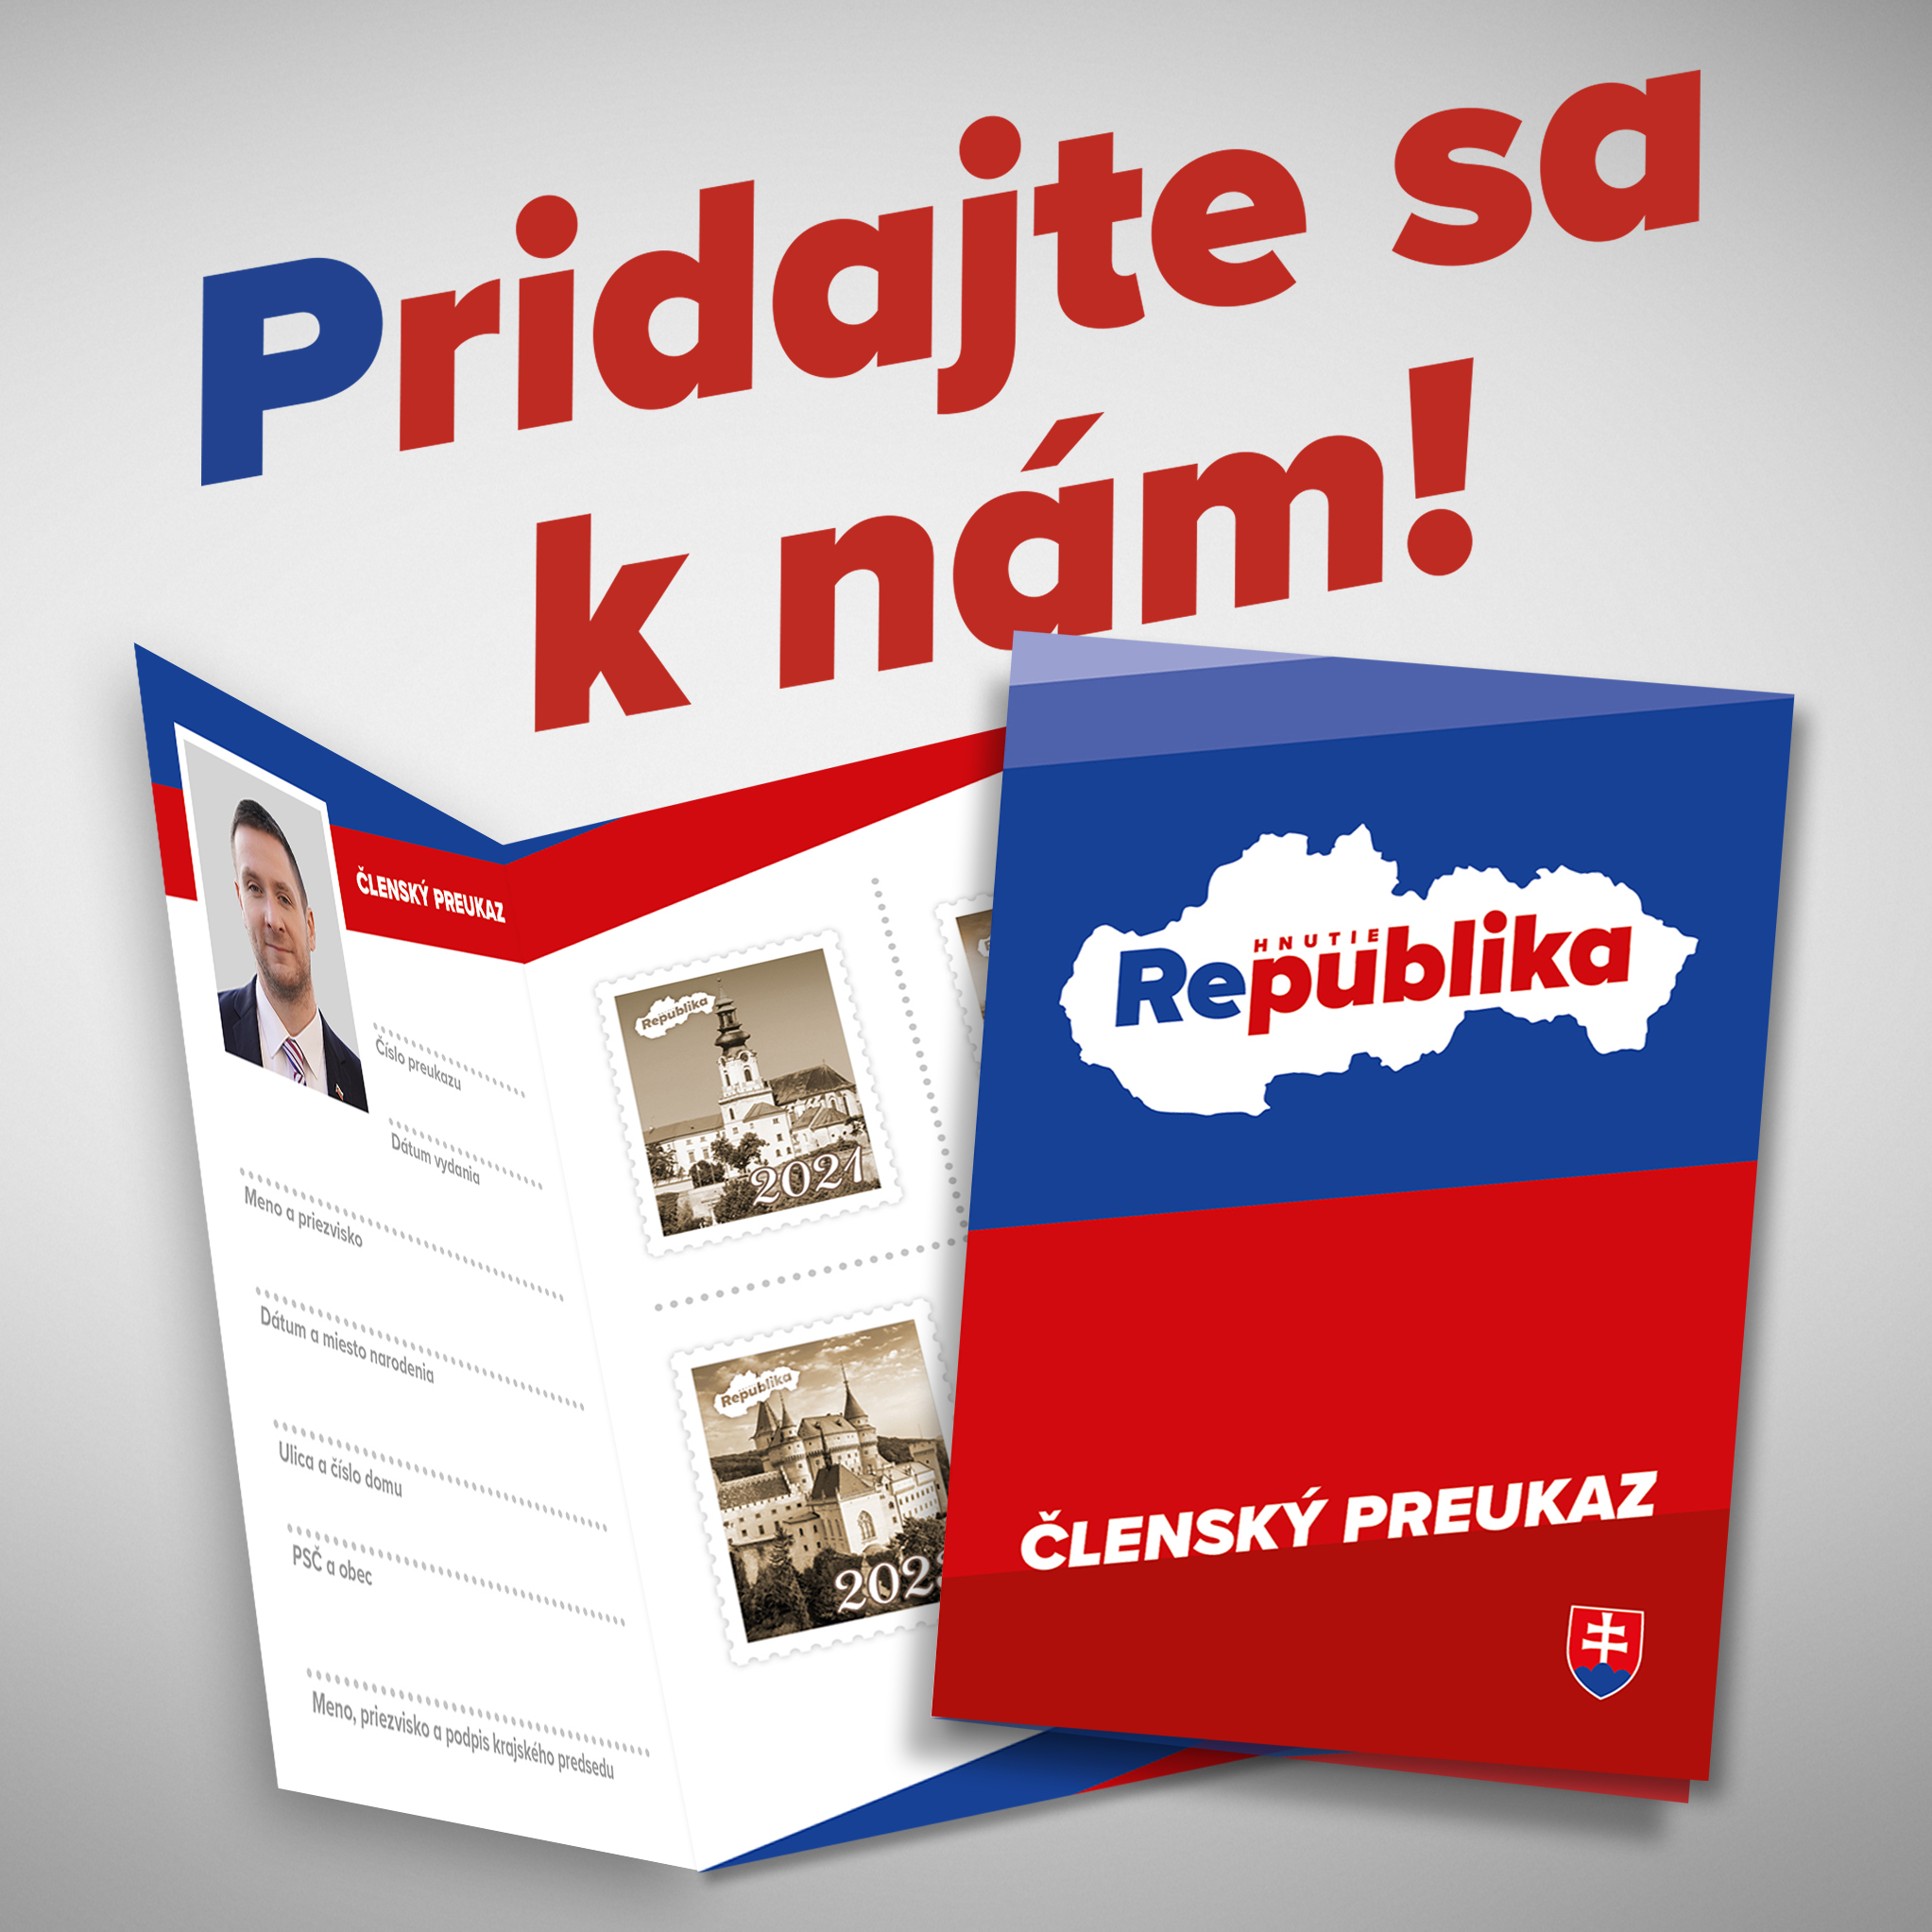 Clensky preukaz REPUBLIKA